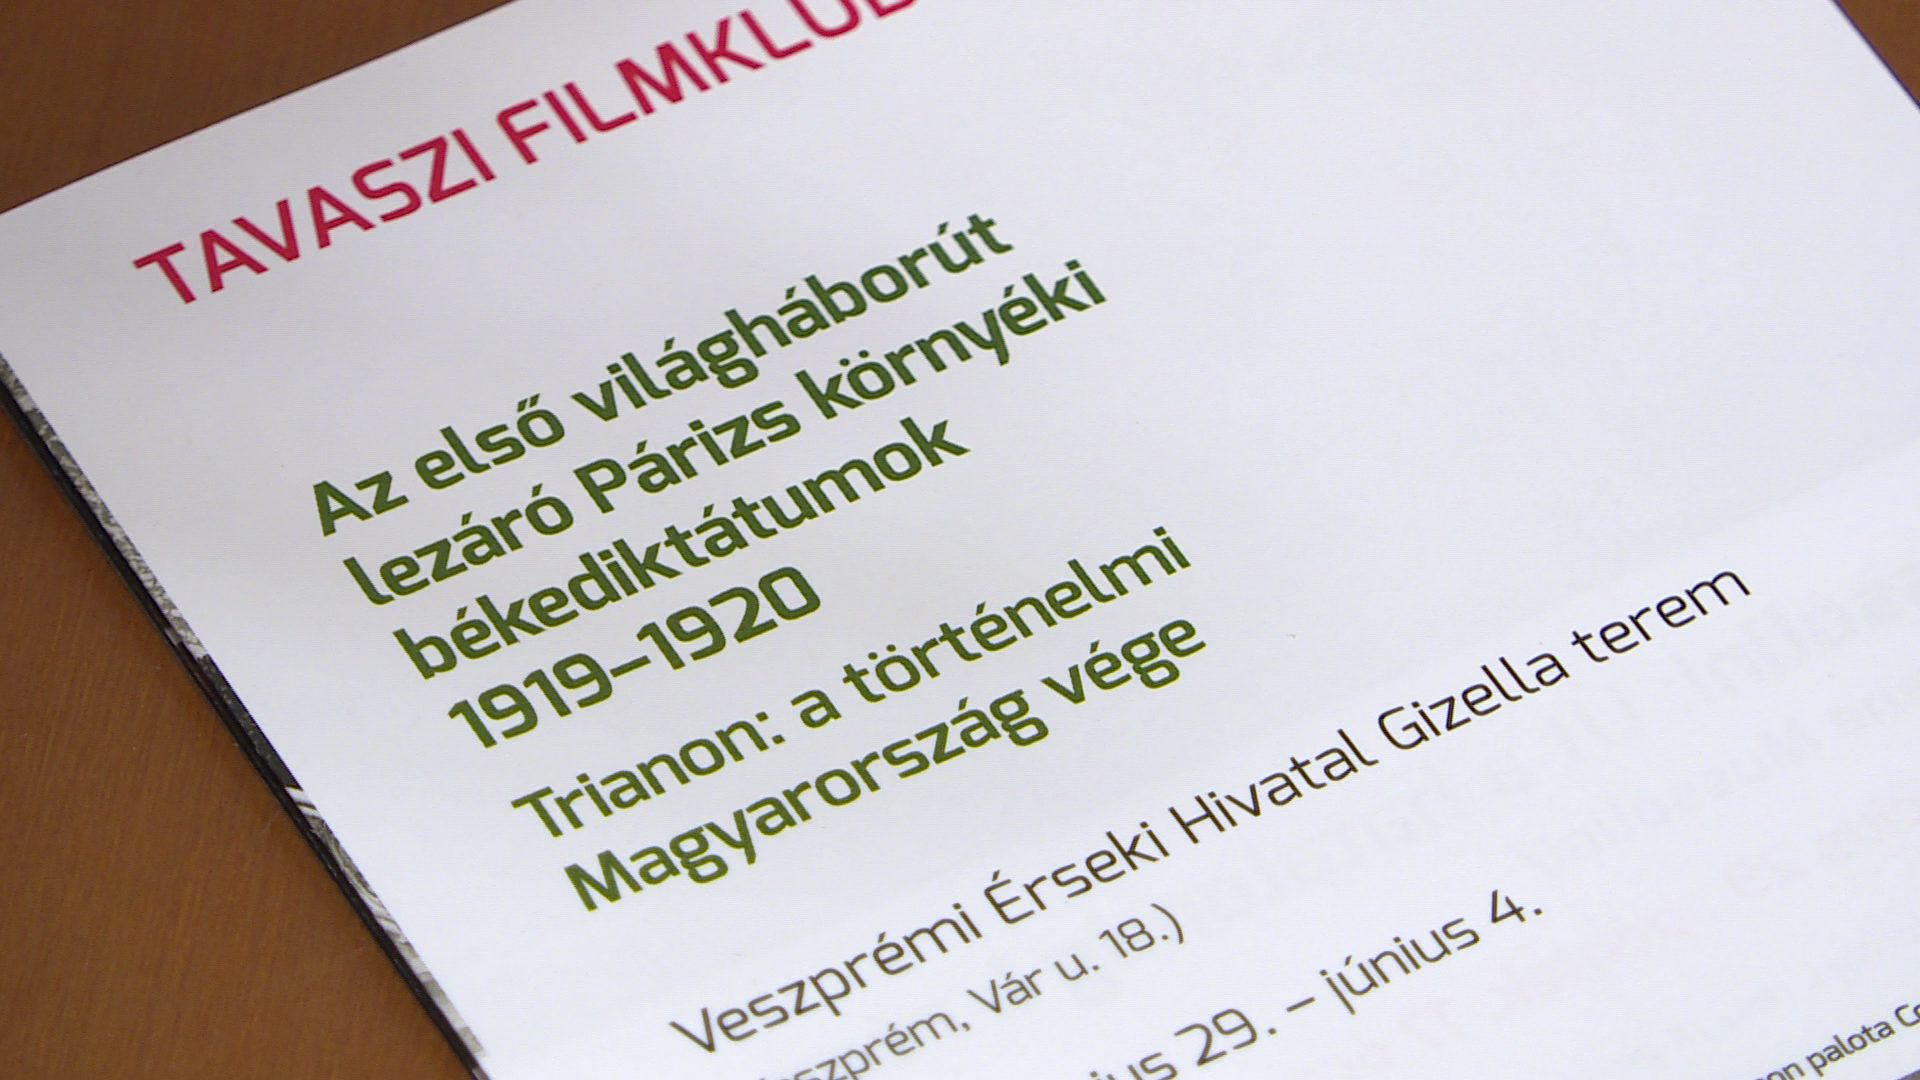 Tavaszi filmklub